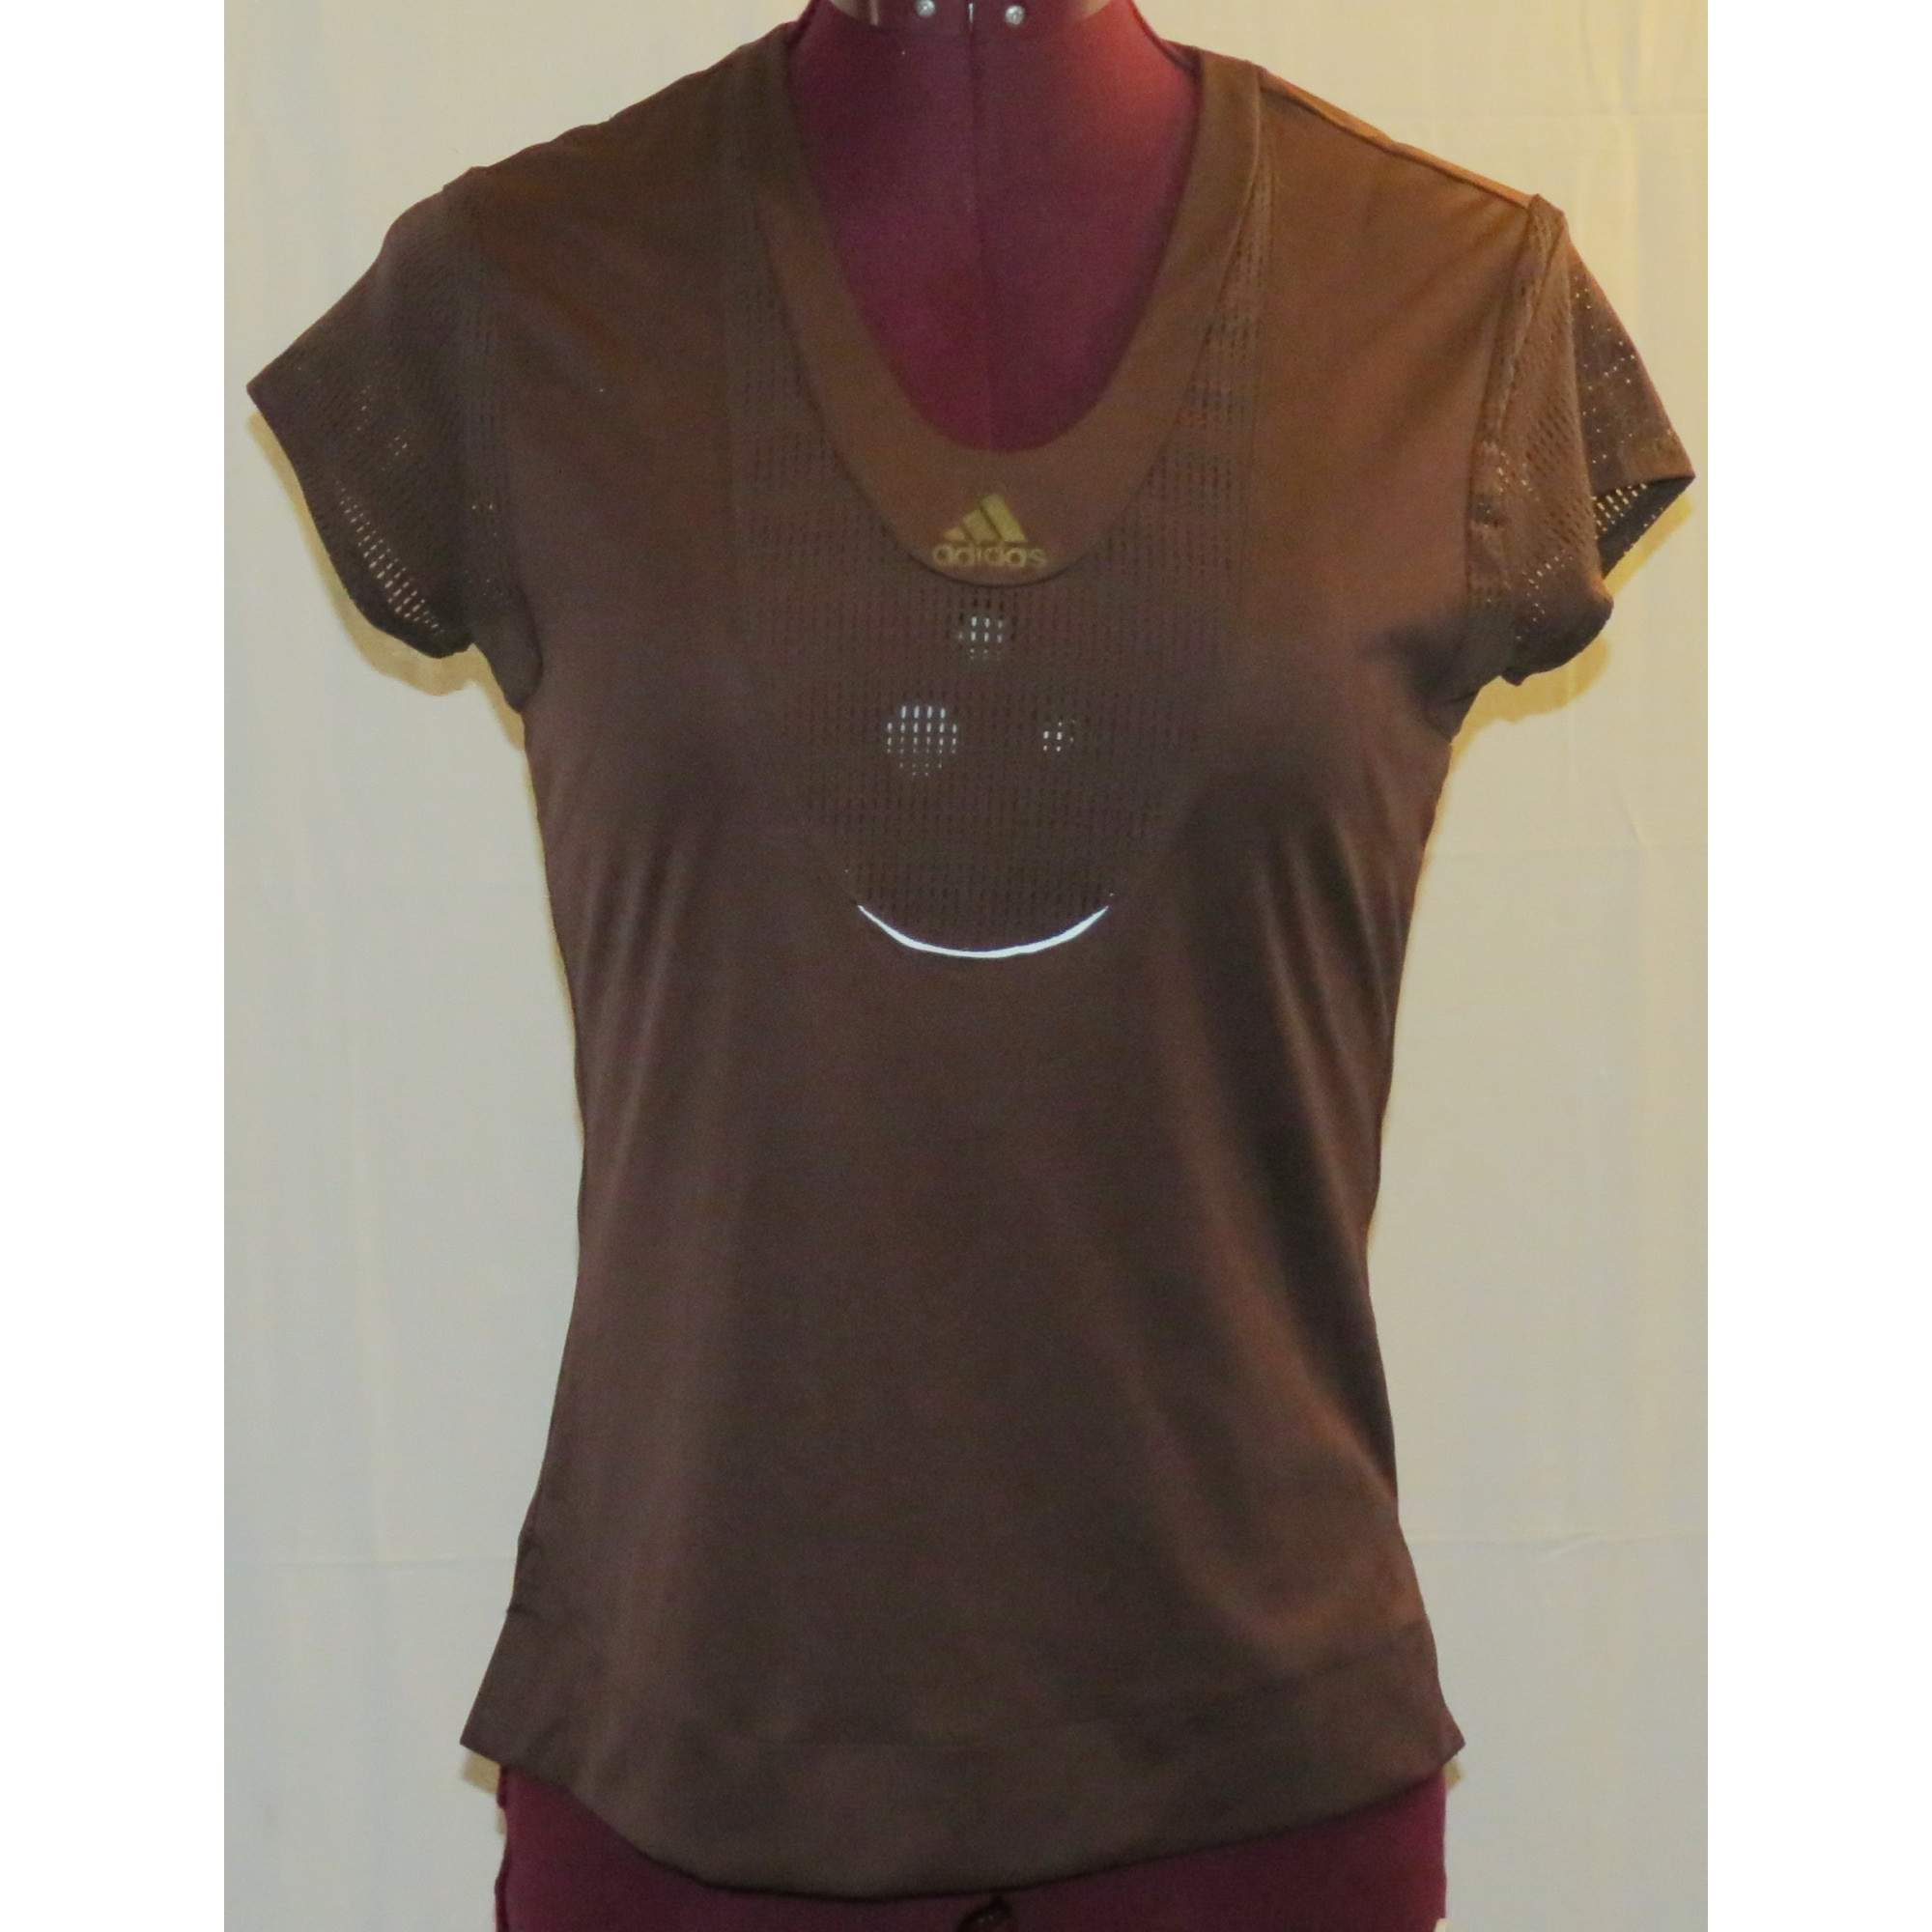 Top, tee-shirt ADIDAS Violet, mauve, lavande